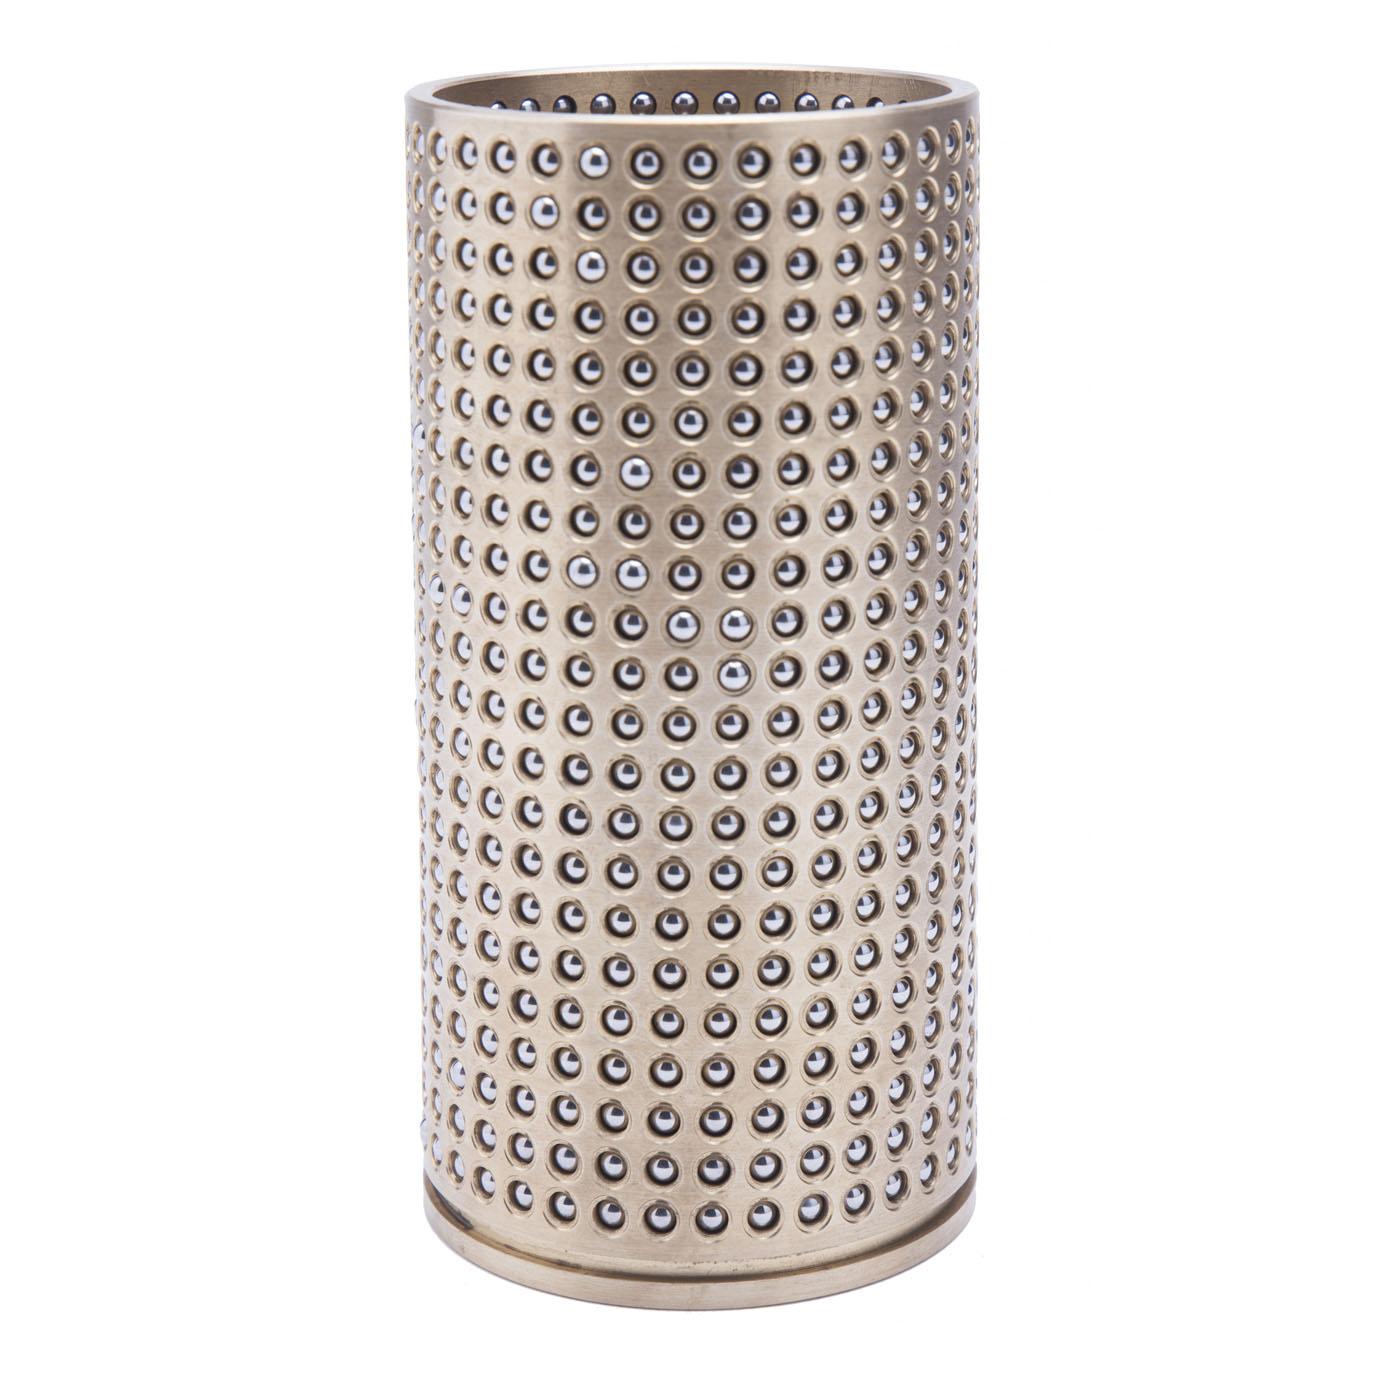 ball-bearing-sliding-ball-bearing-cages-floating-bearings